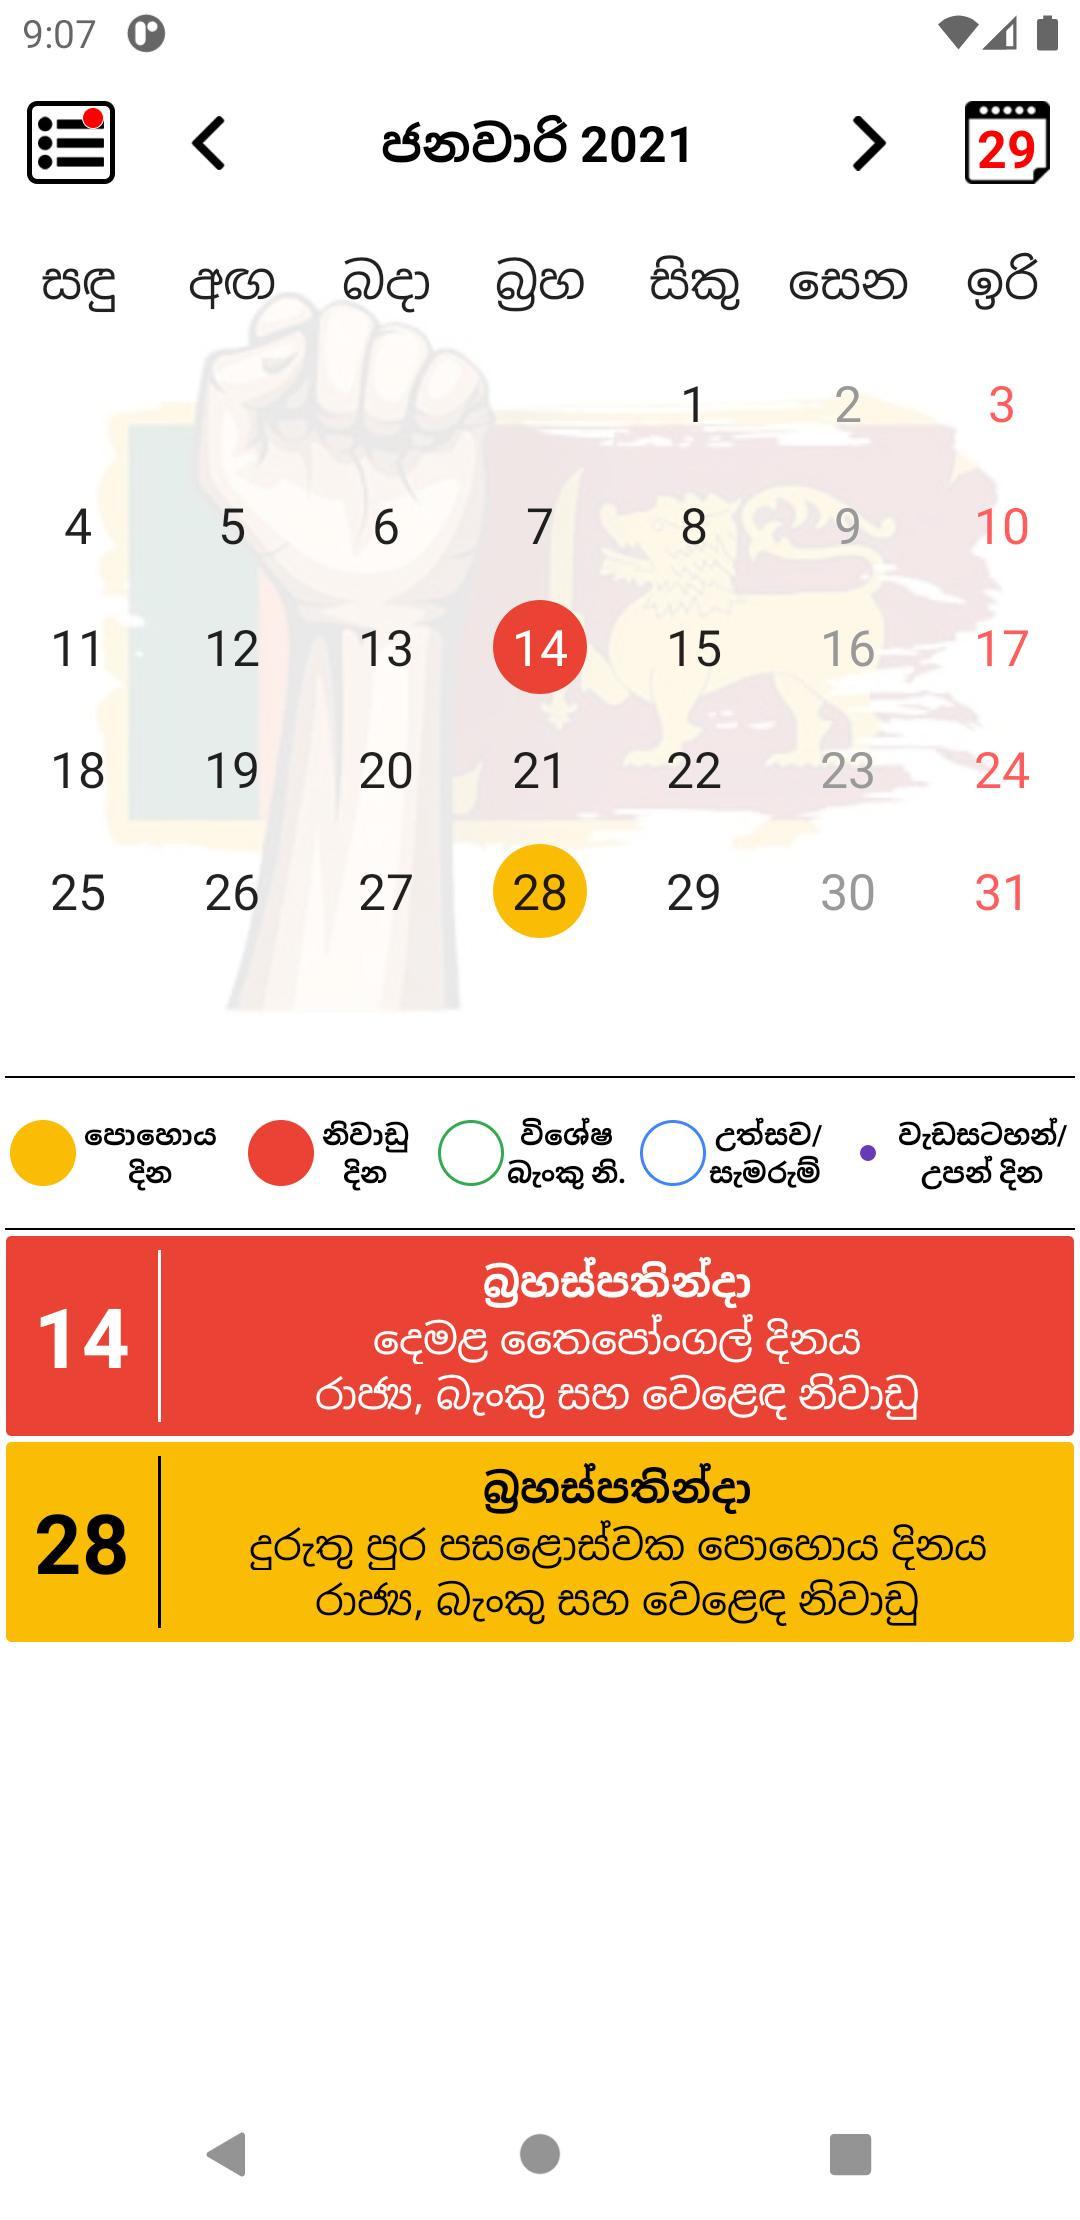 Sri Lanka Calendar 2021 🇱🇰 ¦ Sinhala ¦ Holidays For-Mercantil Holidays For 2021 Sri Lanka